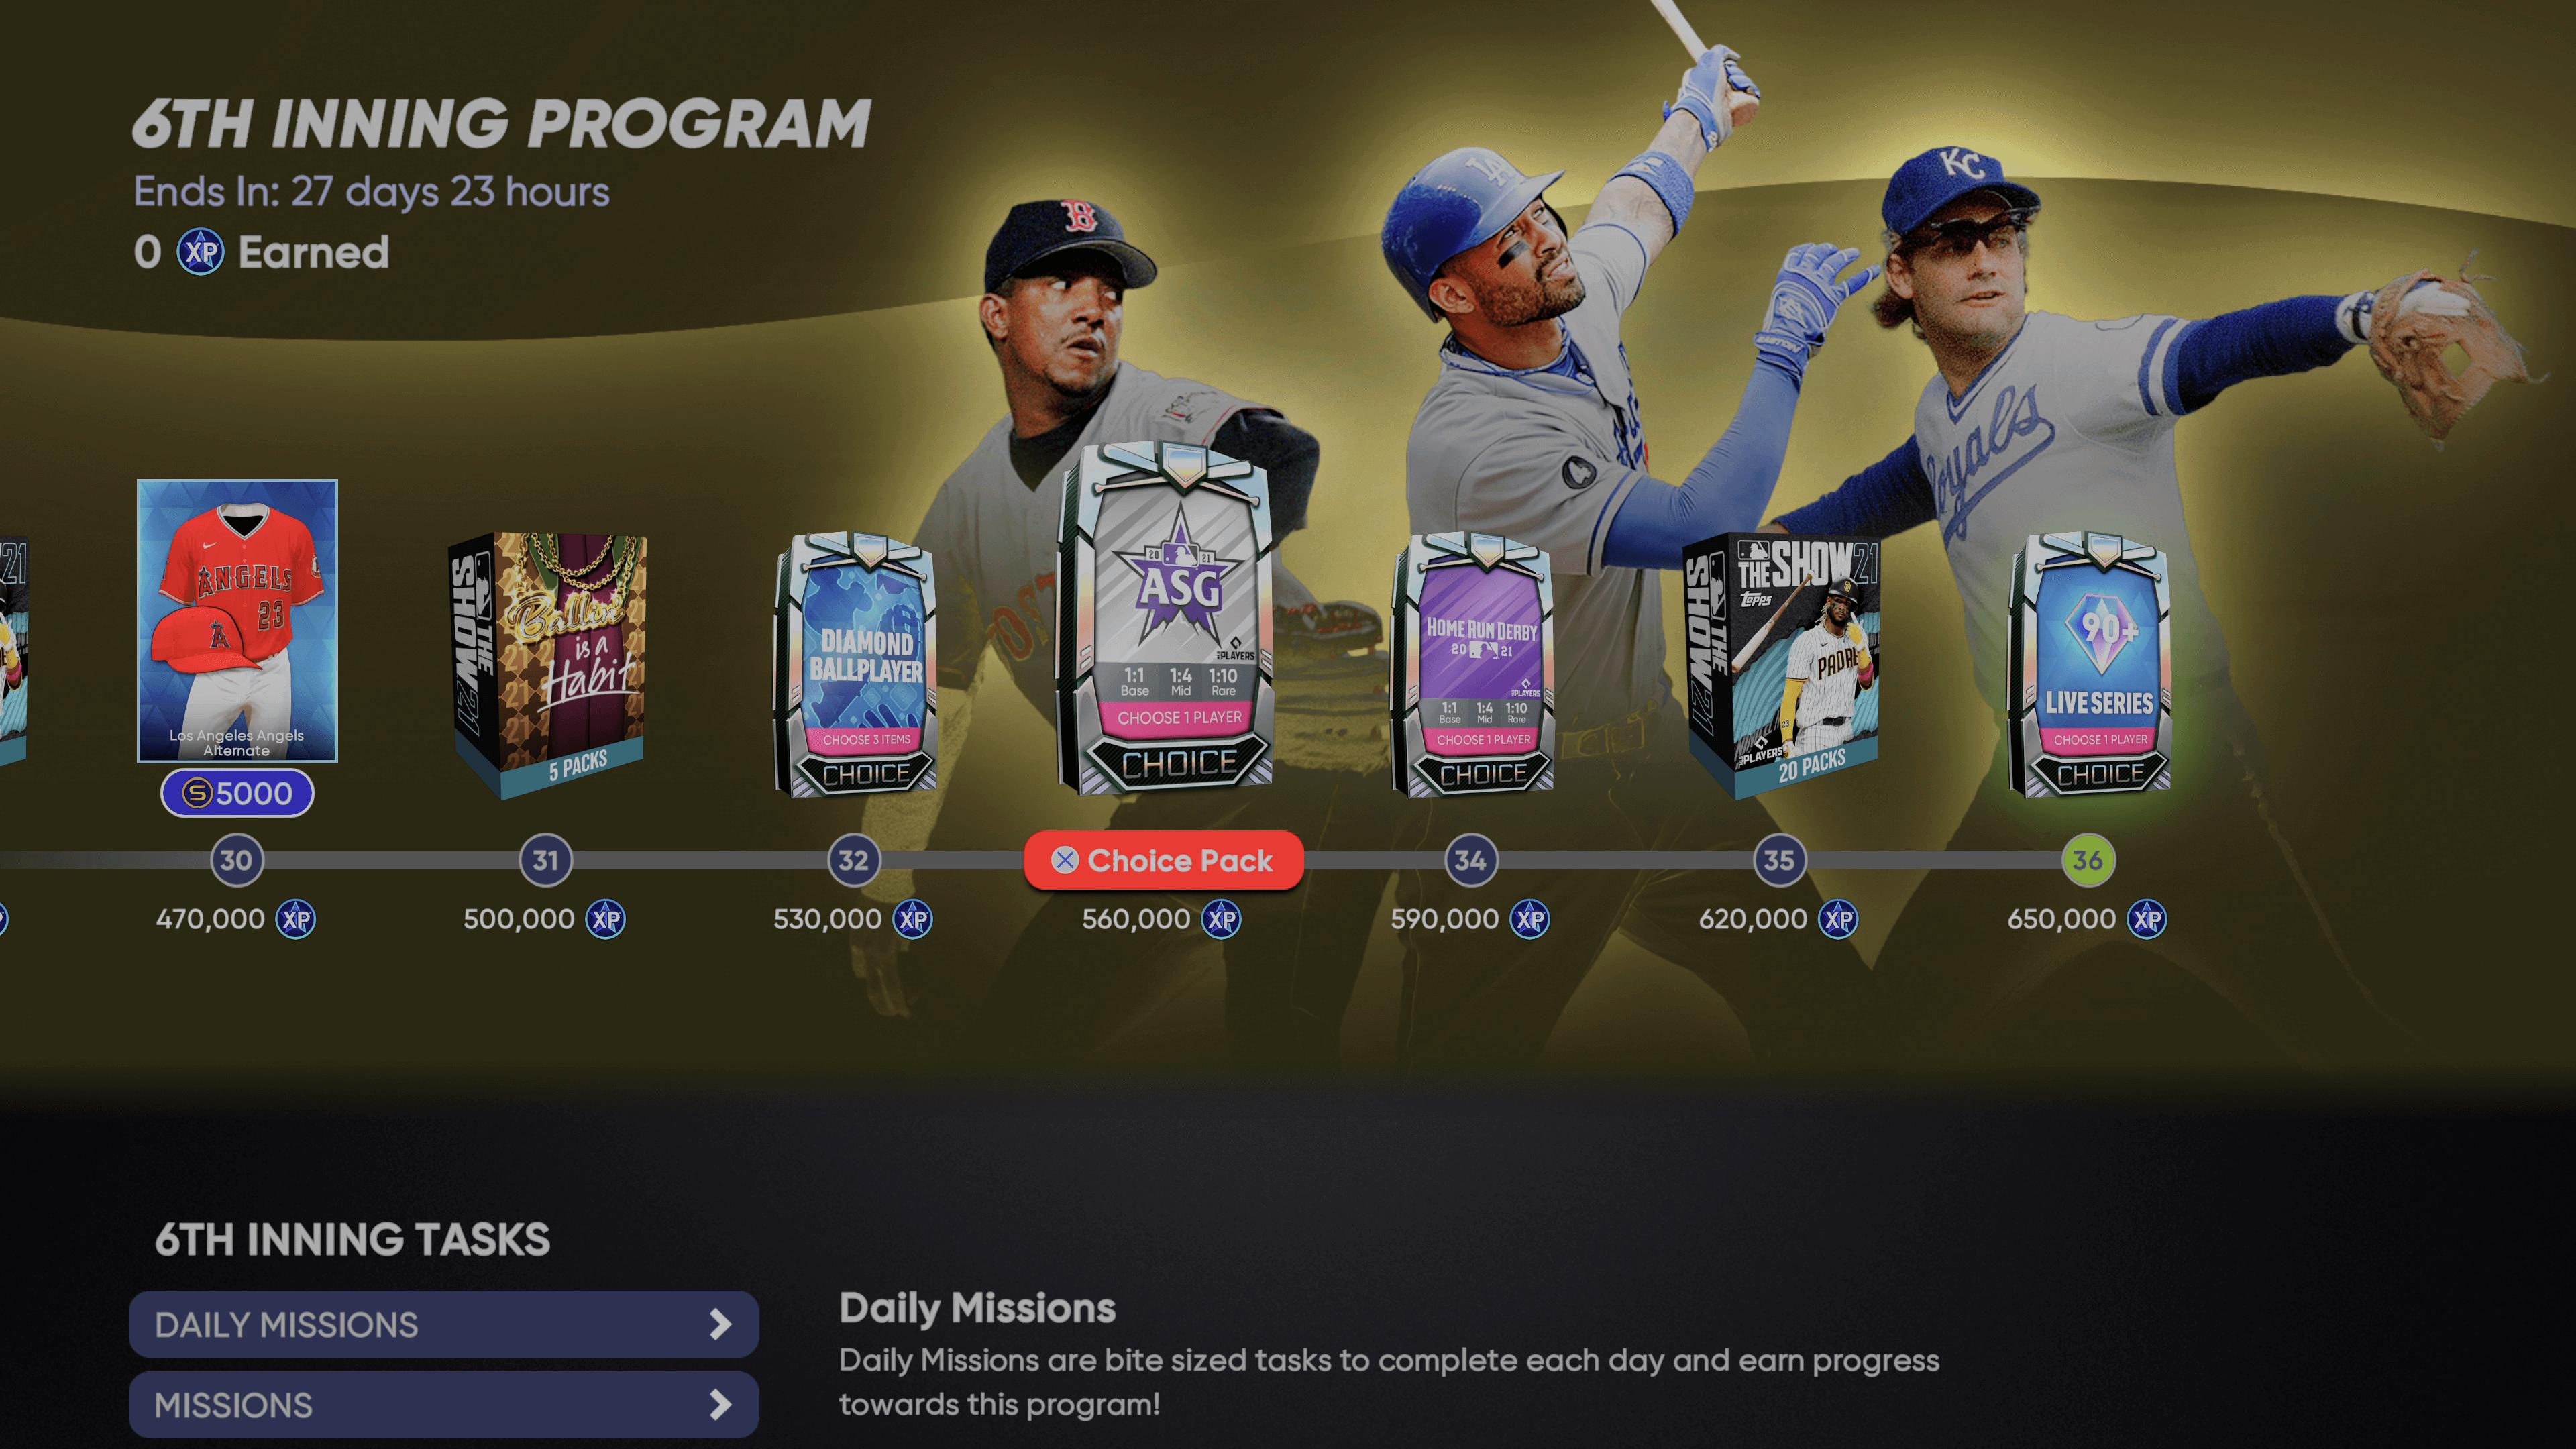 MLB The Show 21 - 6th Inning Program Guide_2021-08-27_15-16-31